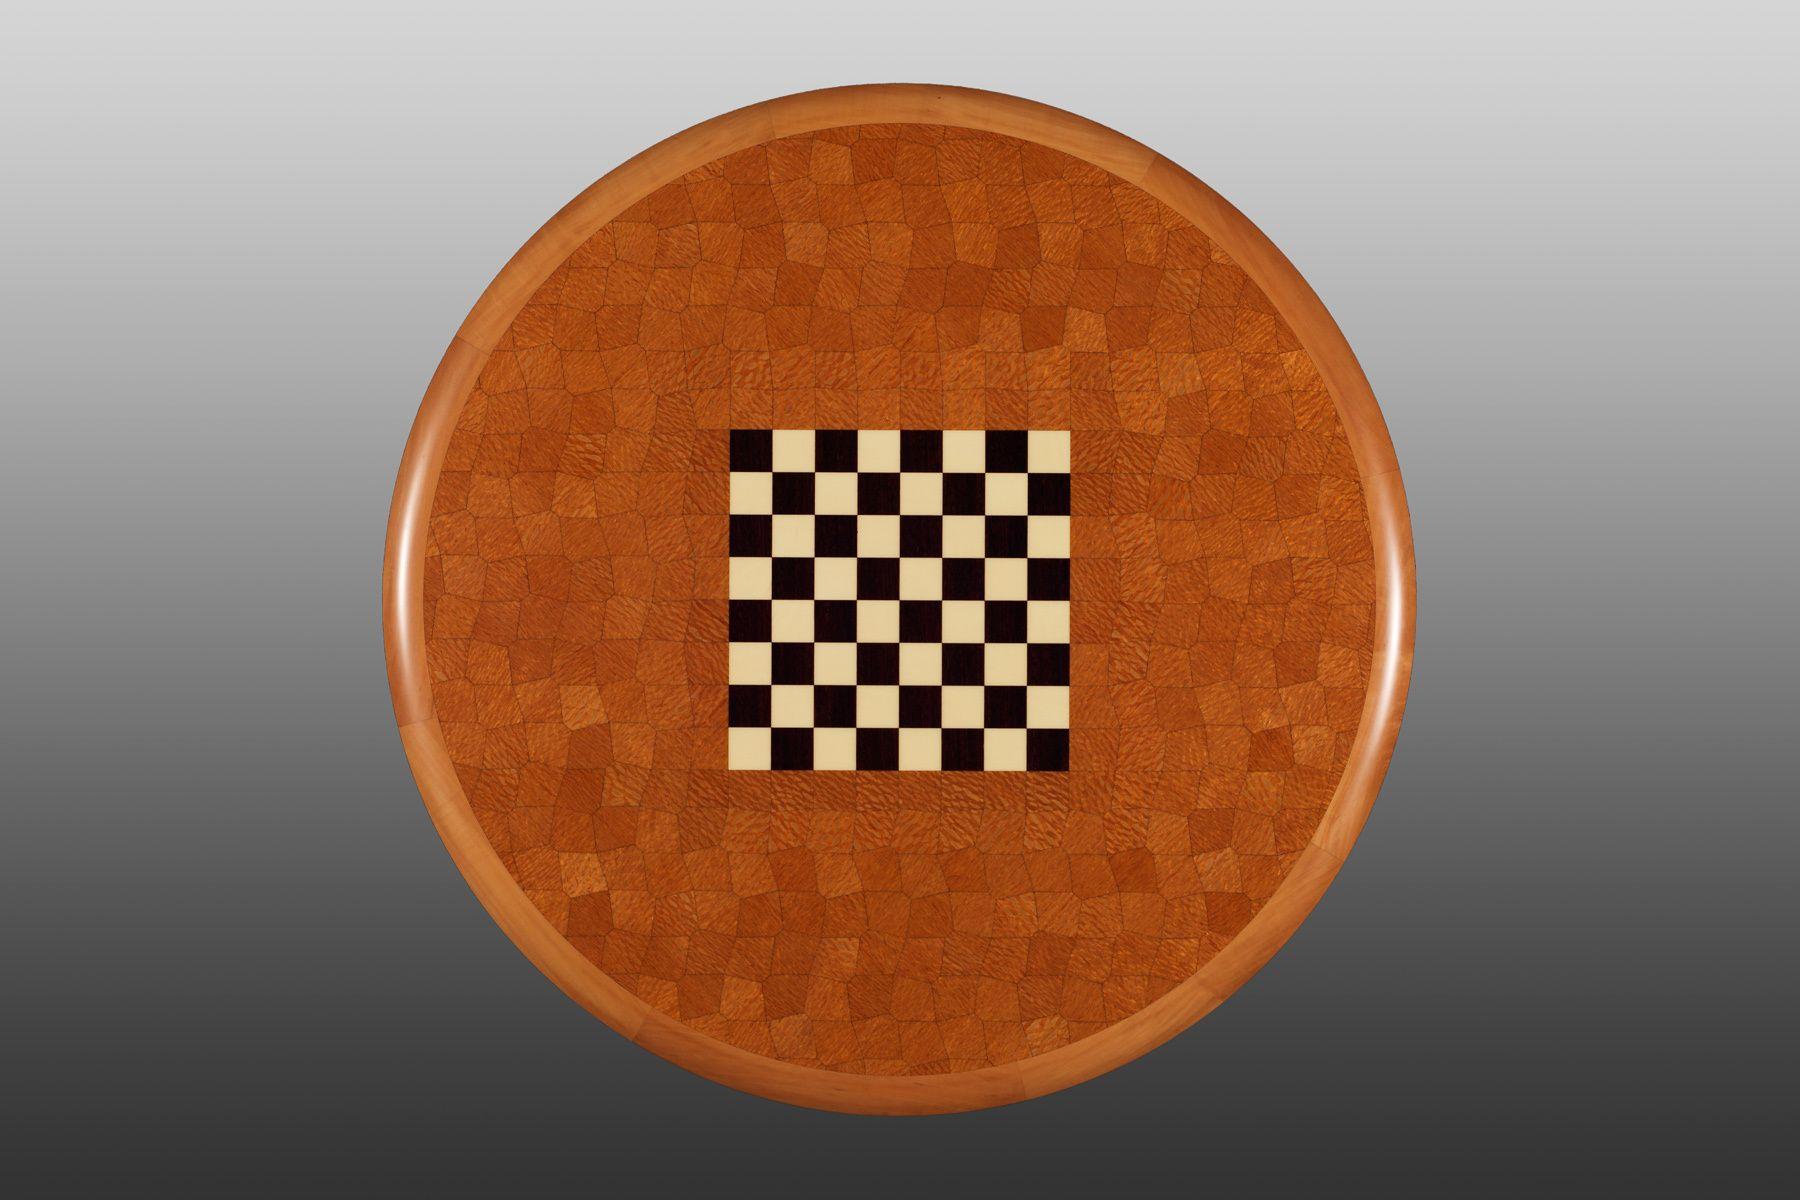 1aaron_levine_contemporary_modern_studio_furniture_maker_wood_woodworker_art_artist_northwest_parquetry_tessellation_game_chess_table_chessellation_lacewood_detail4.jpg